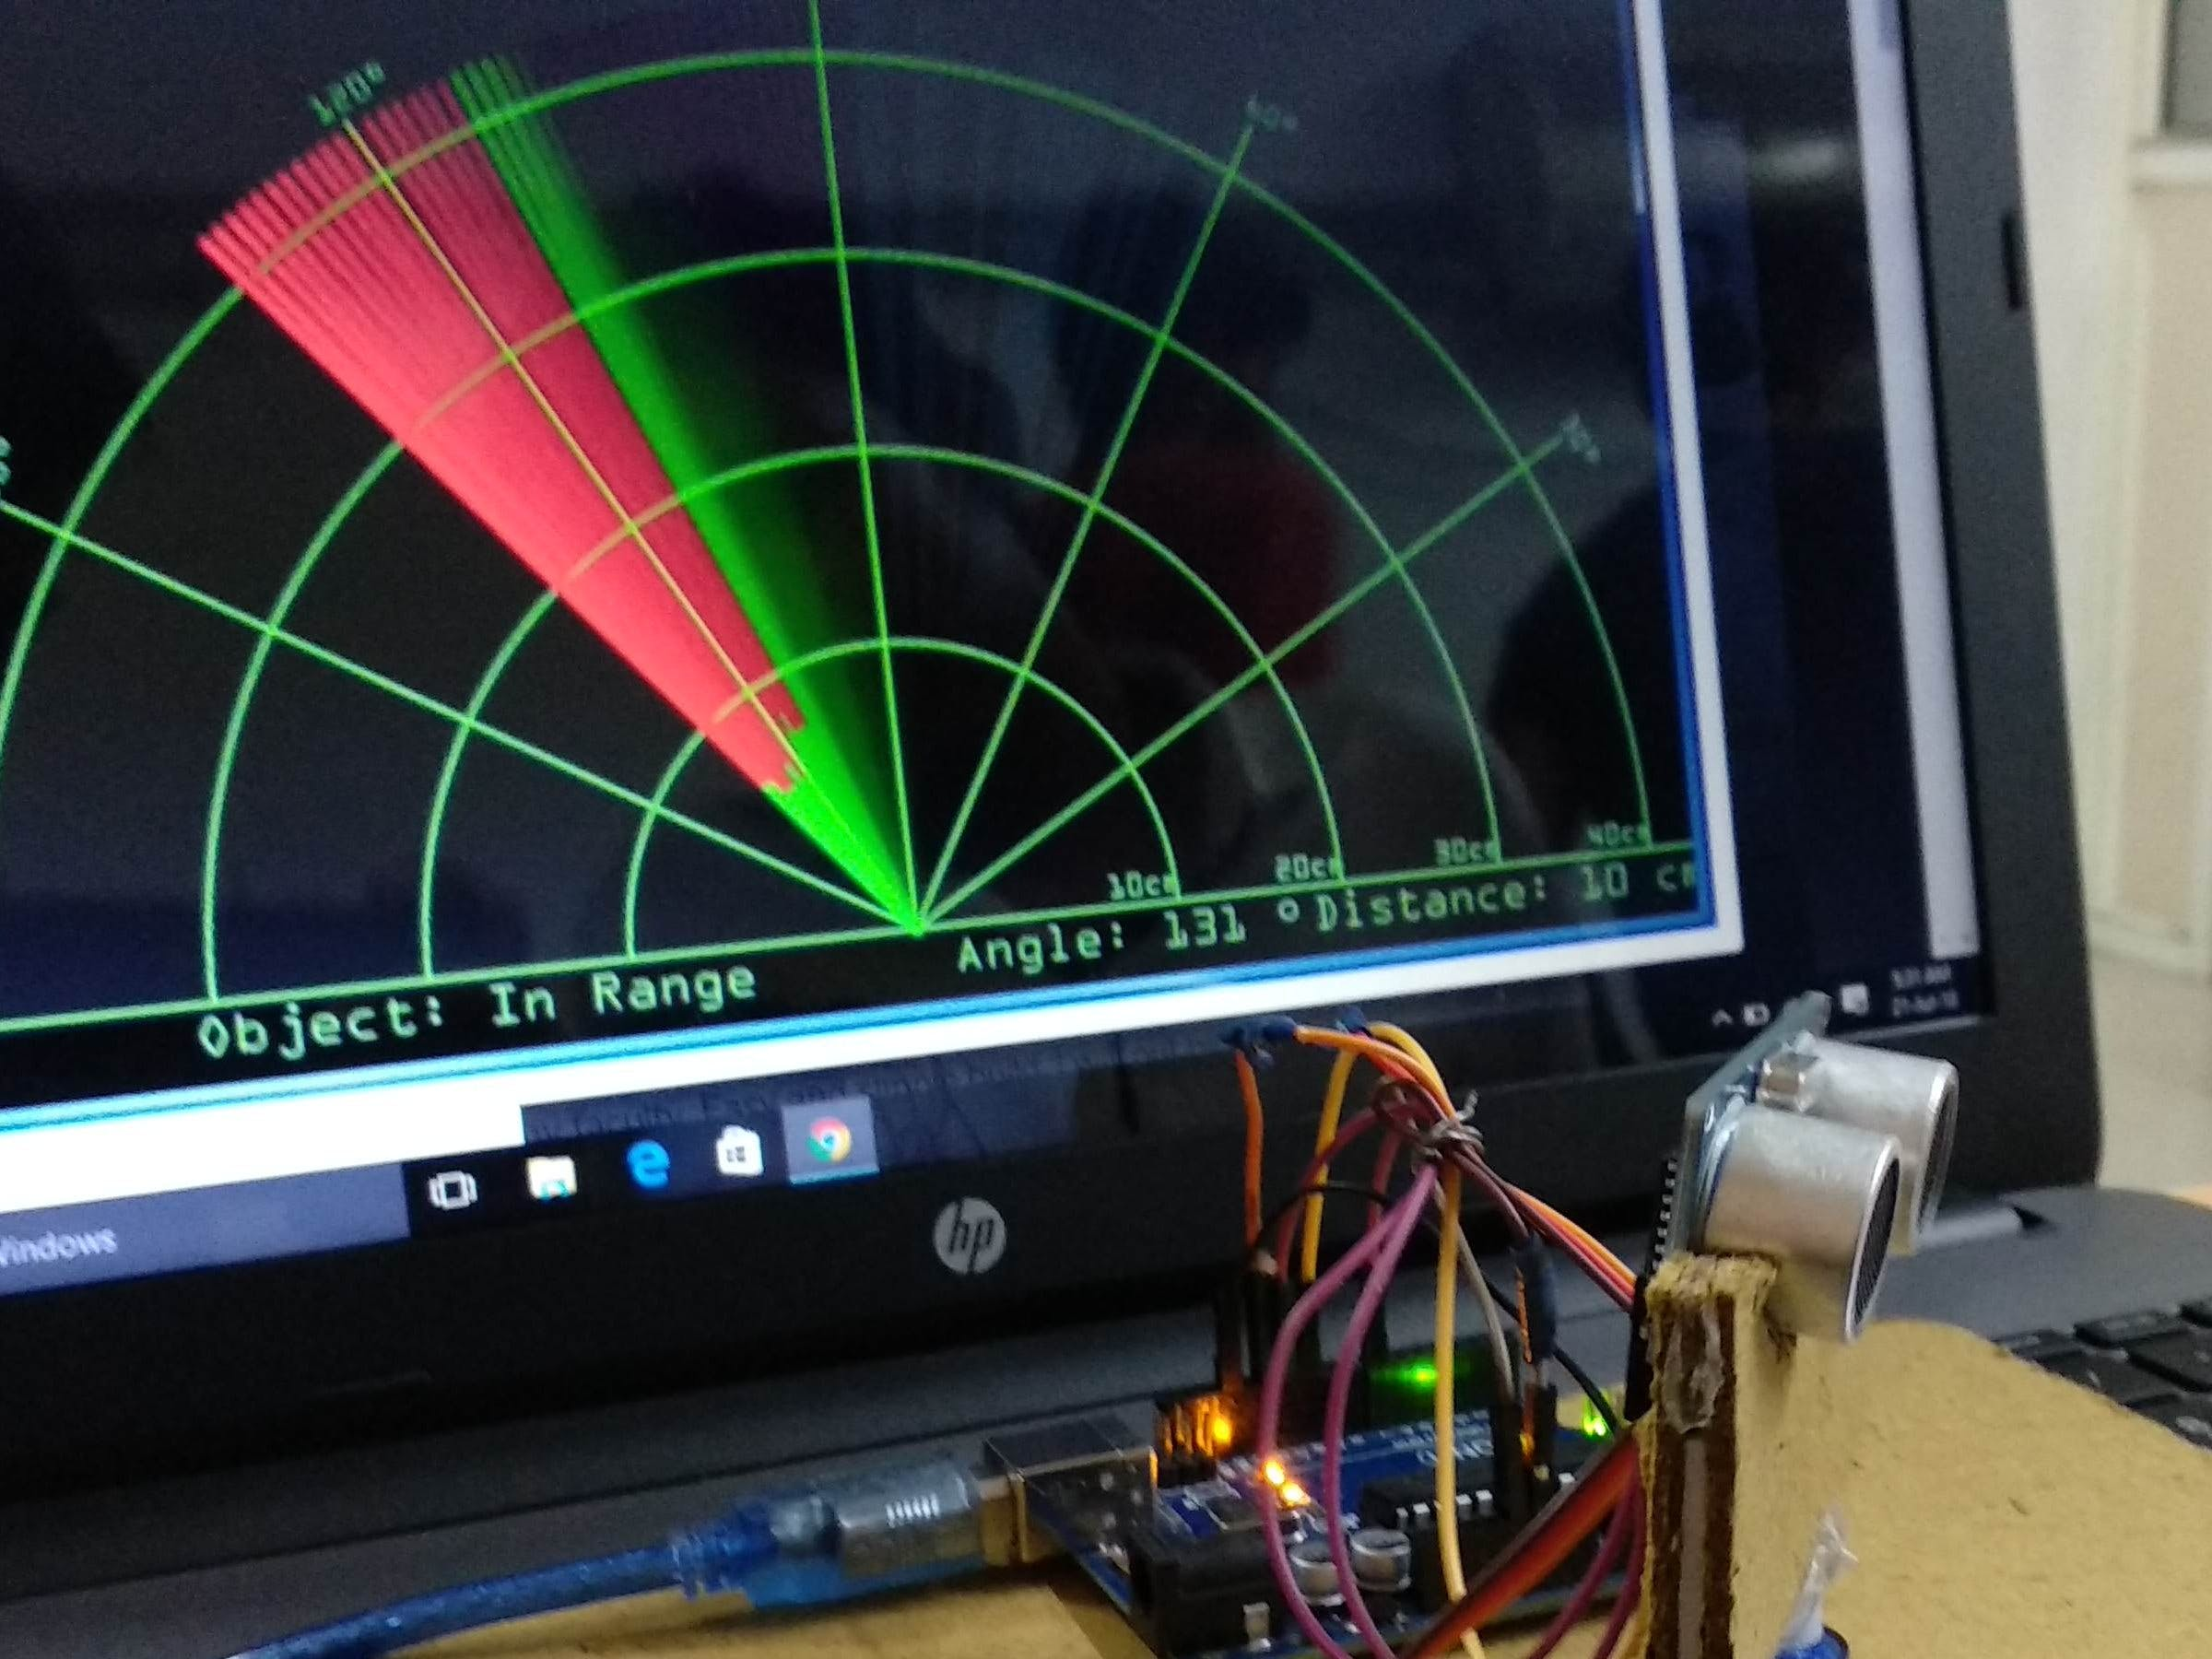 How to Make Radar at Home